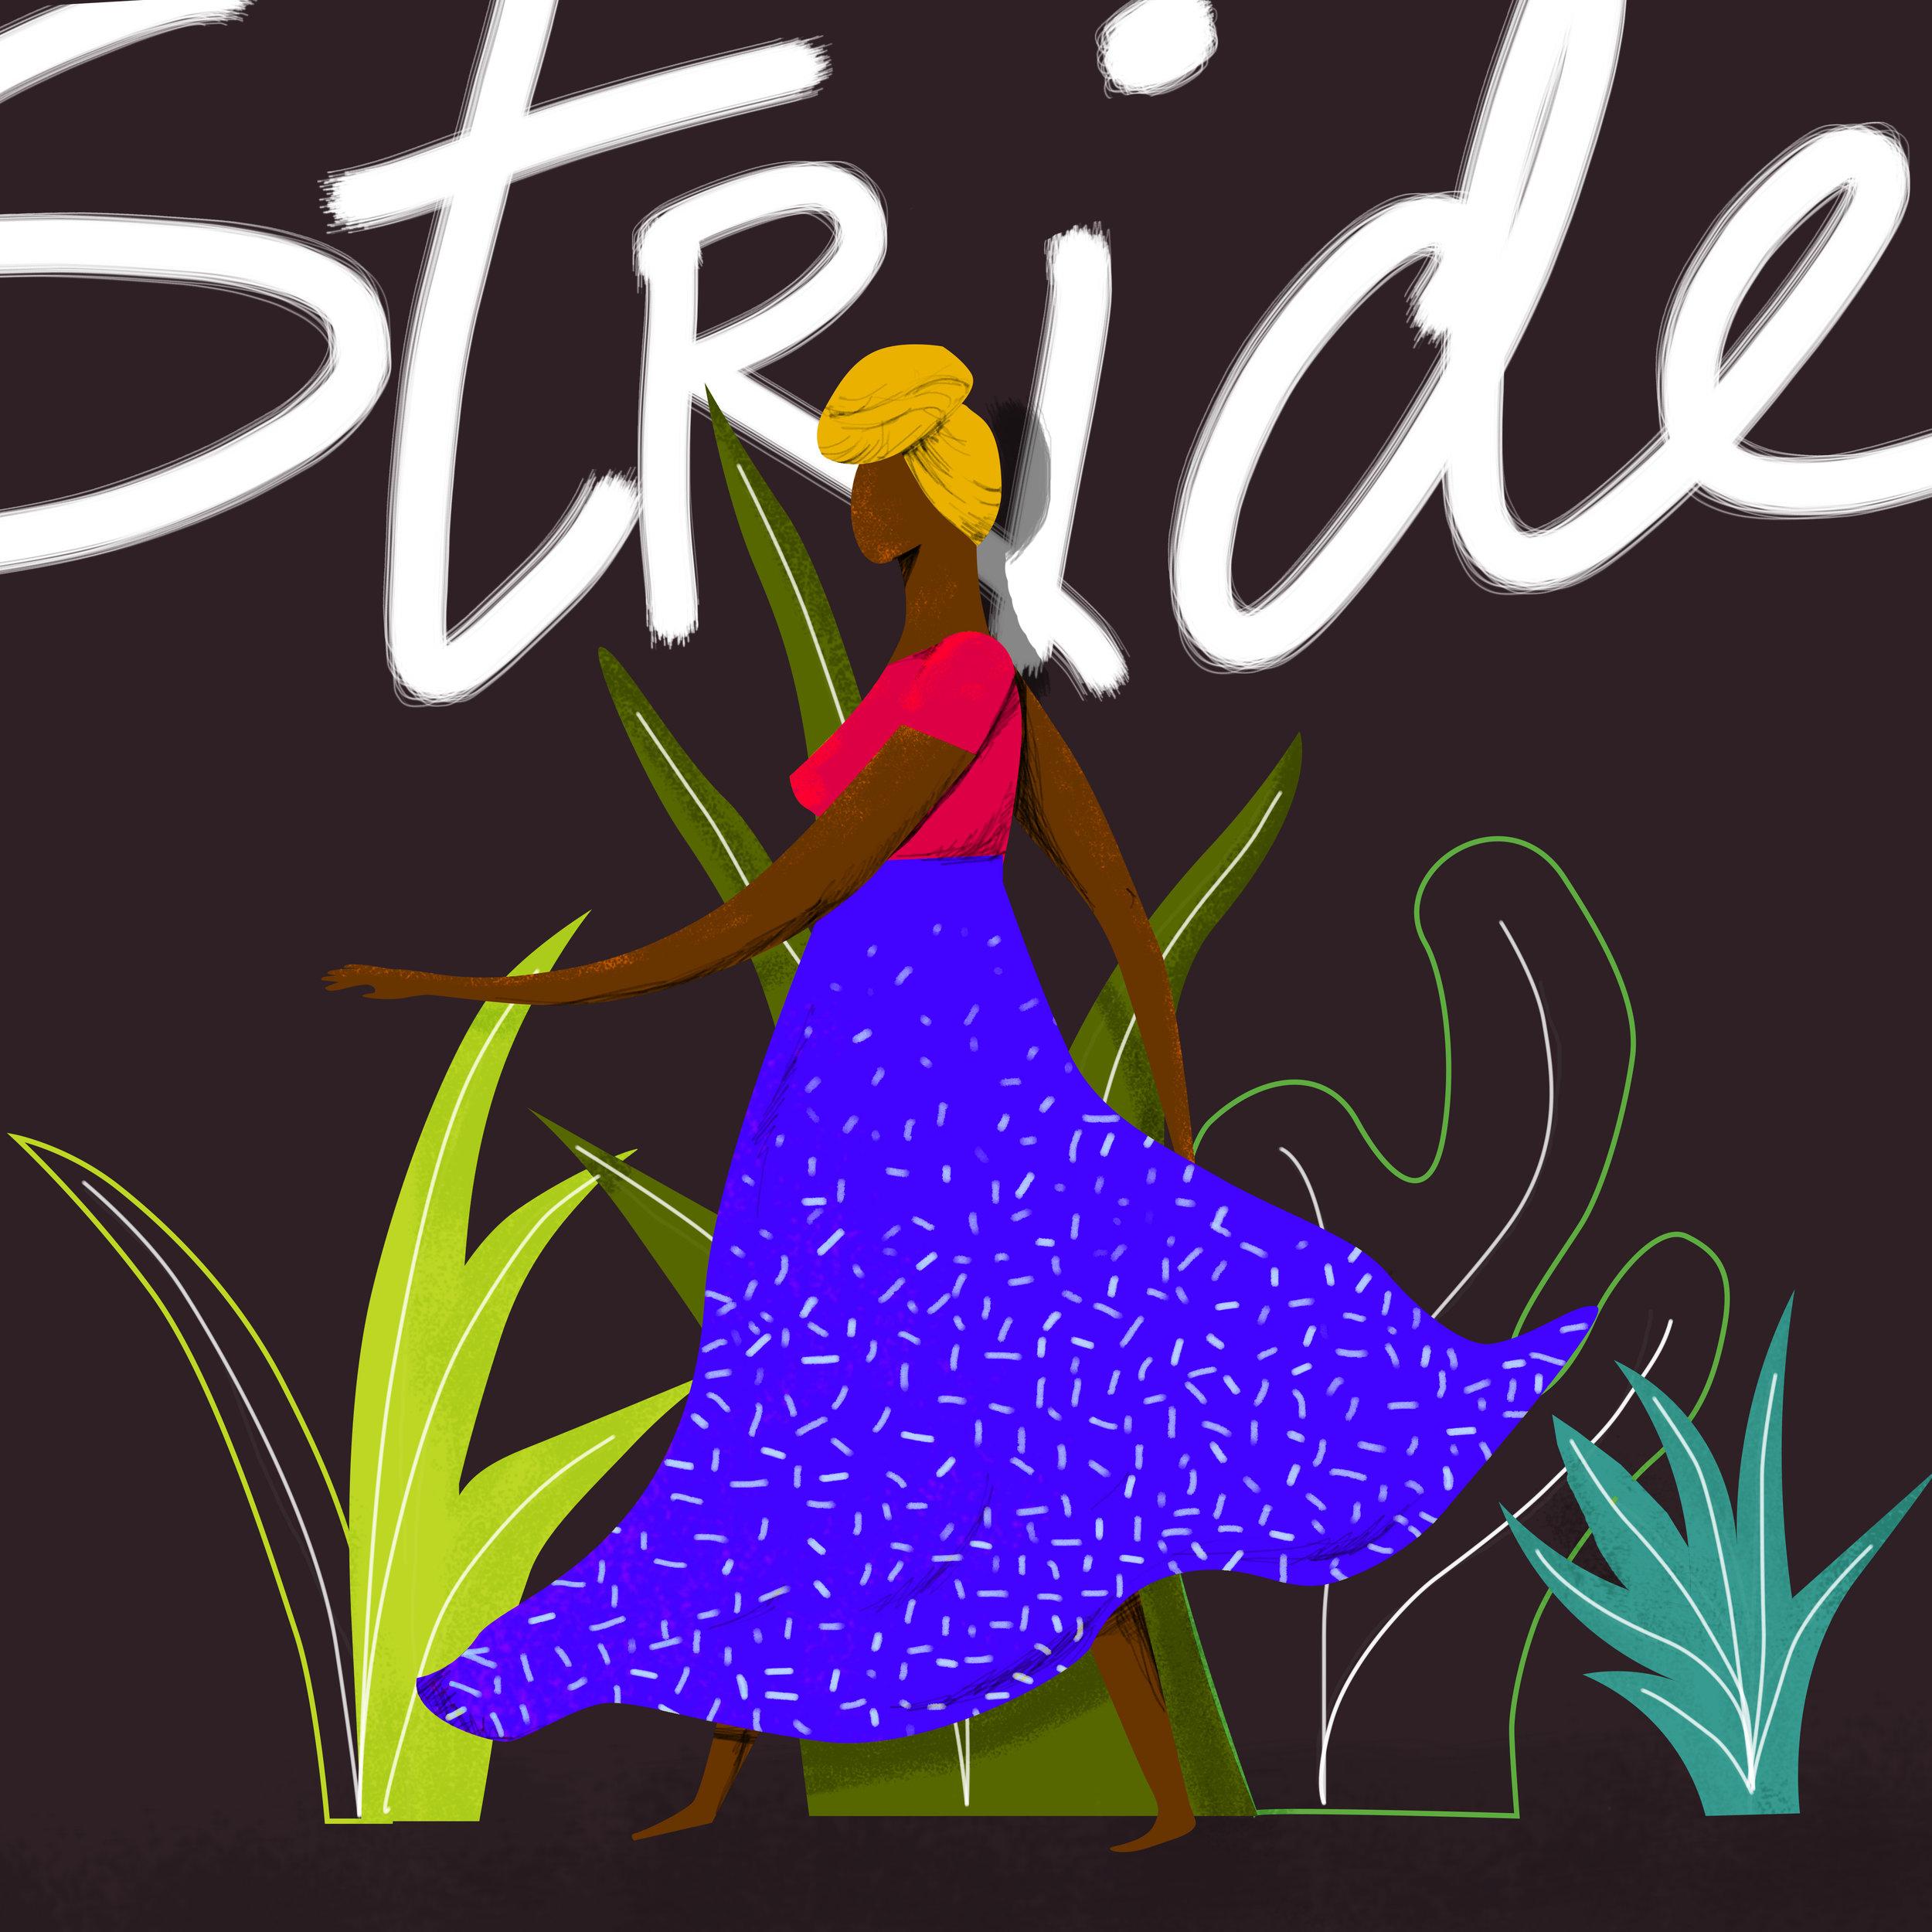 woman_Stride_02.jpg